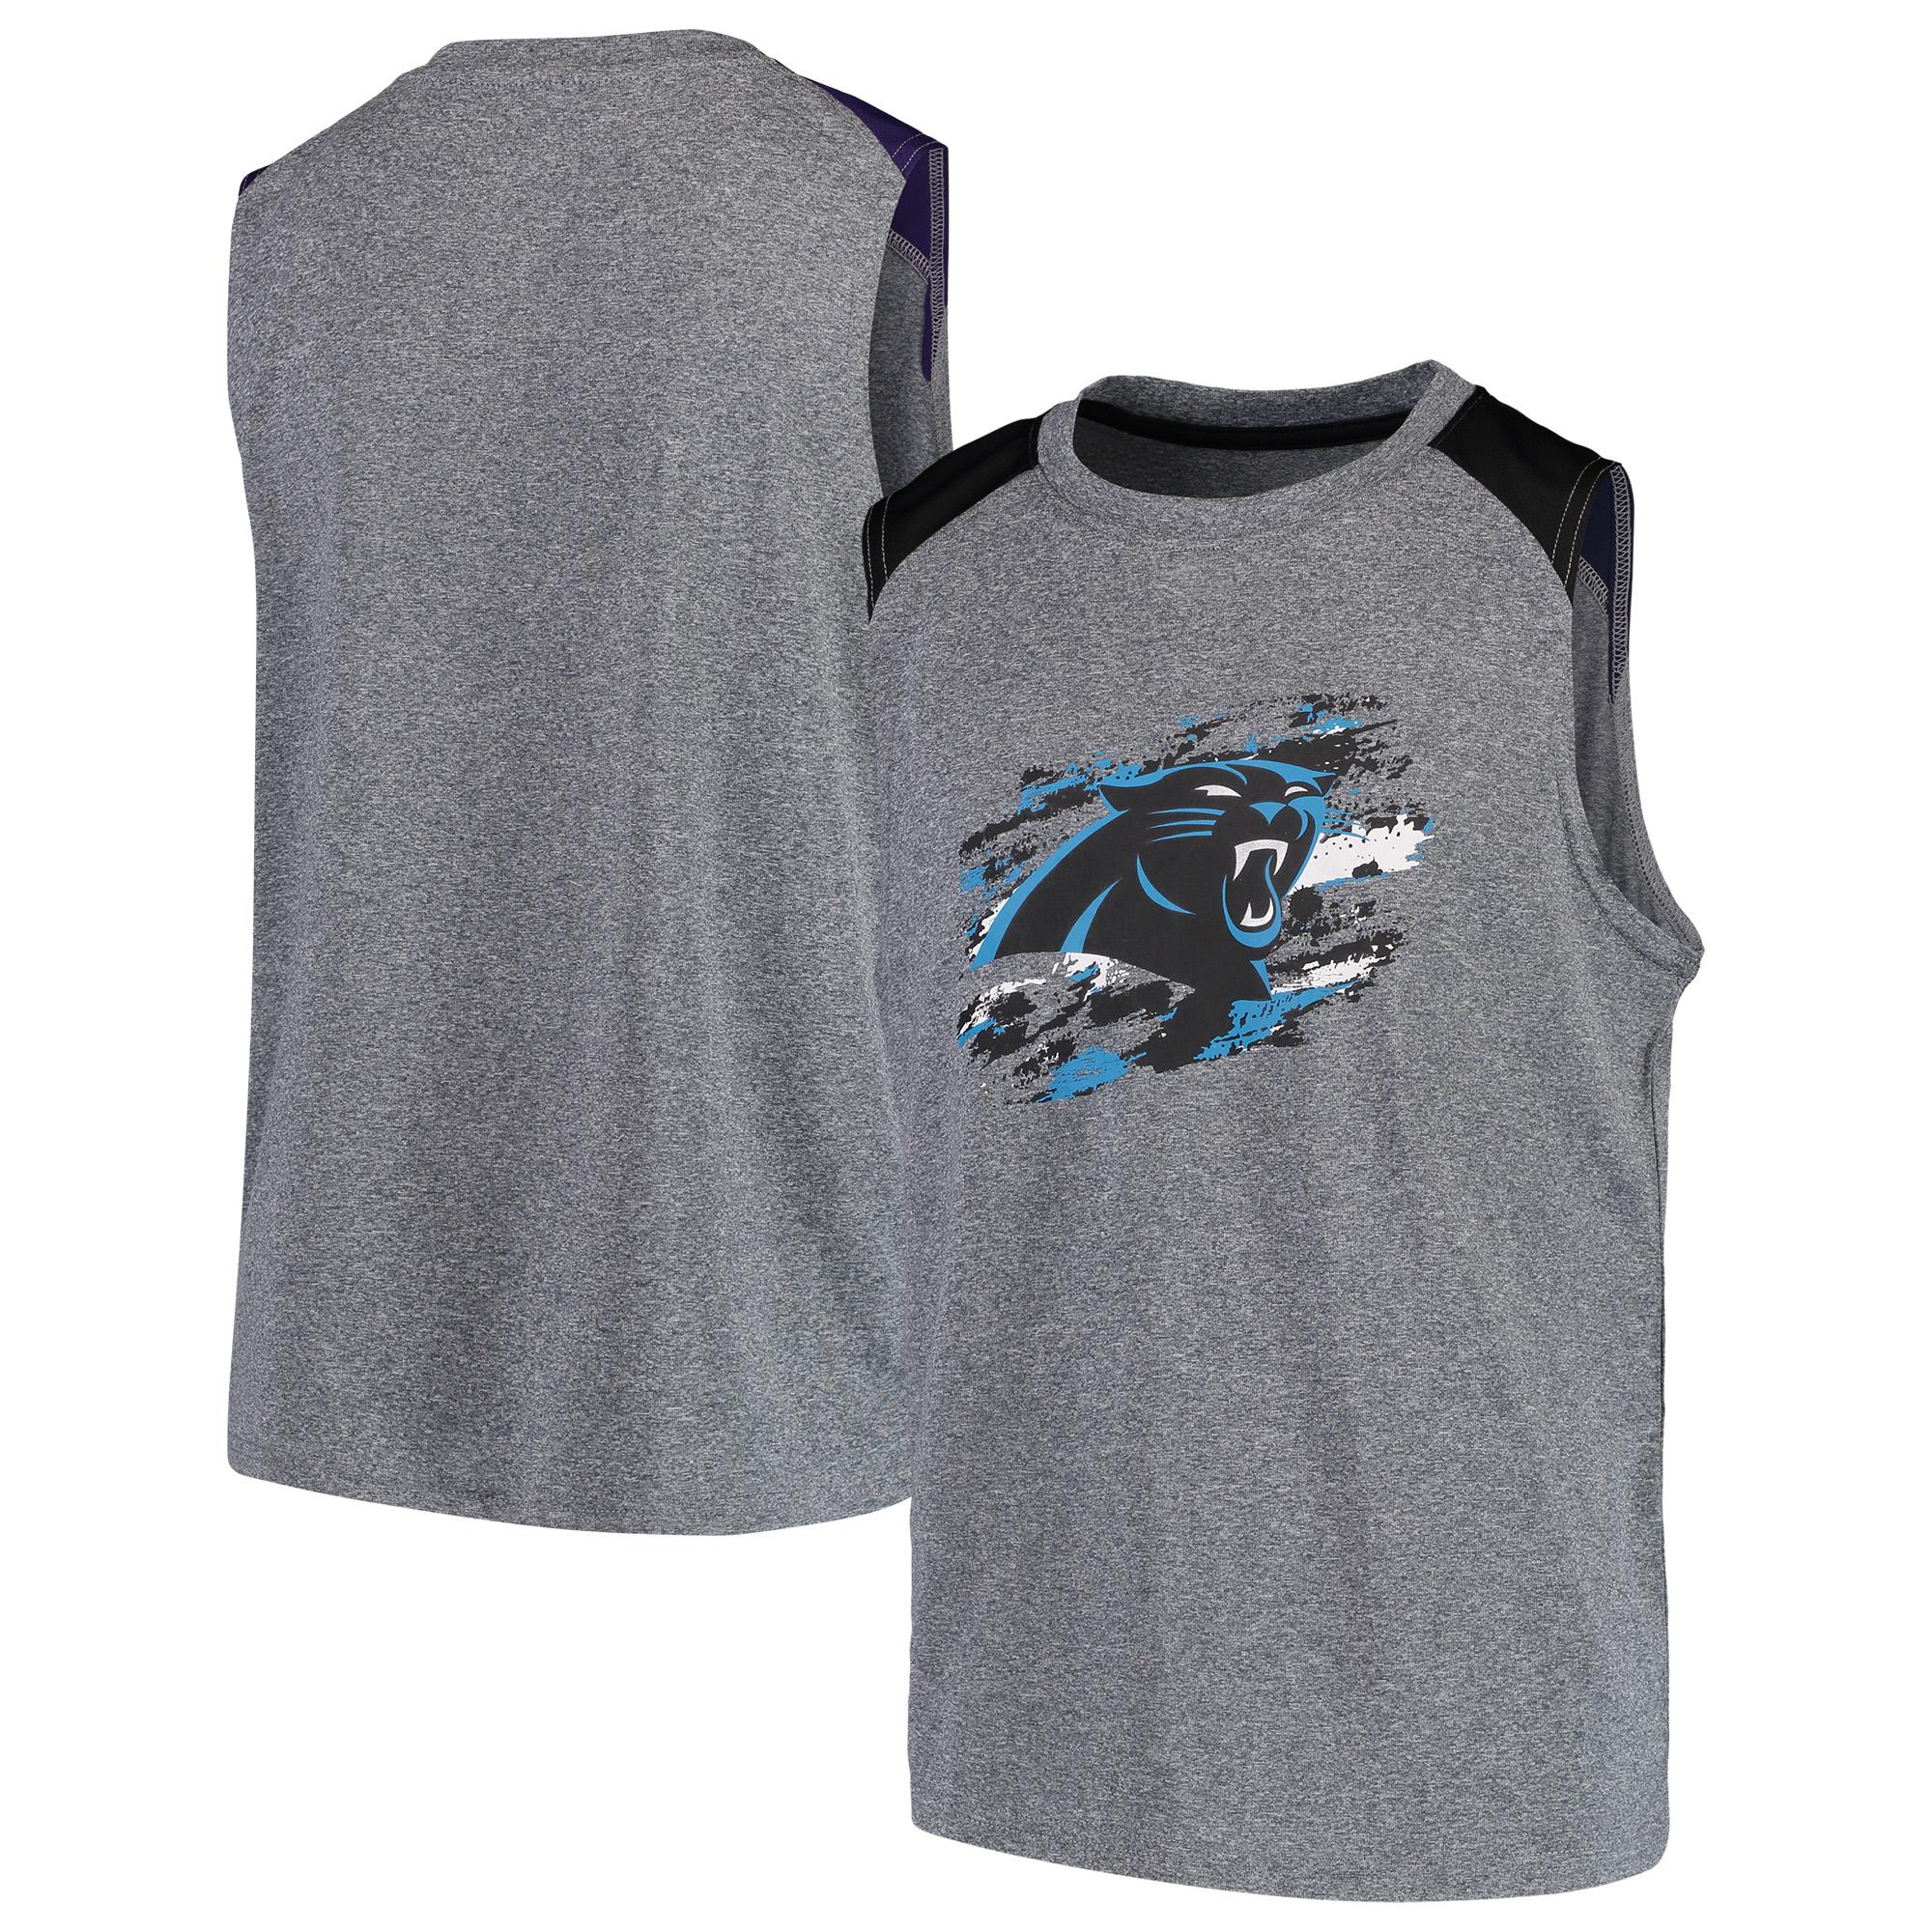 Carolina Panthers NFL Pro Line by Fanatics Branded Youth True Colors Sleeveless T-Shirt - Heathered Gray